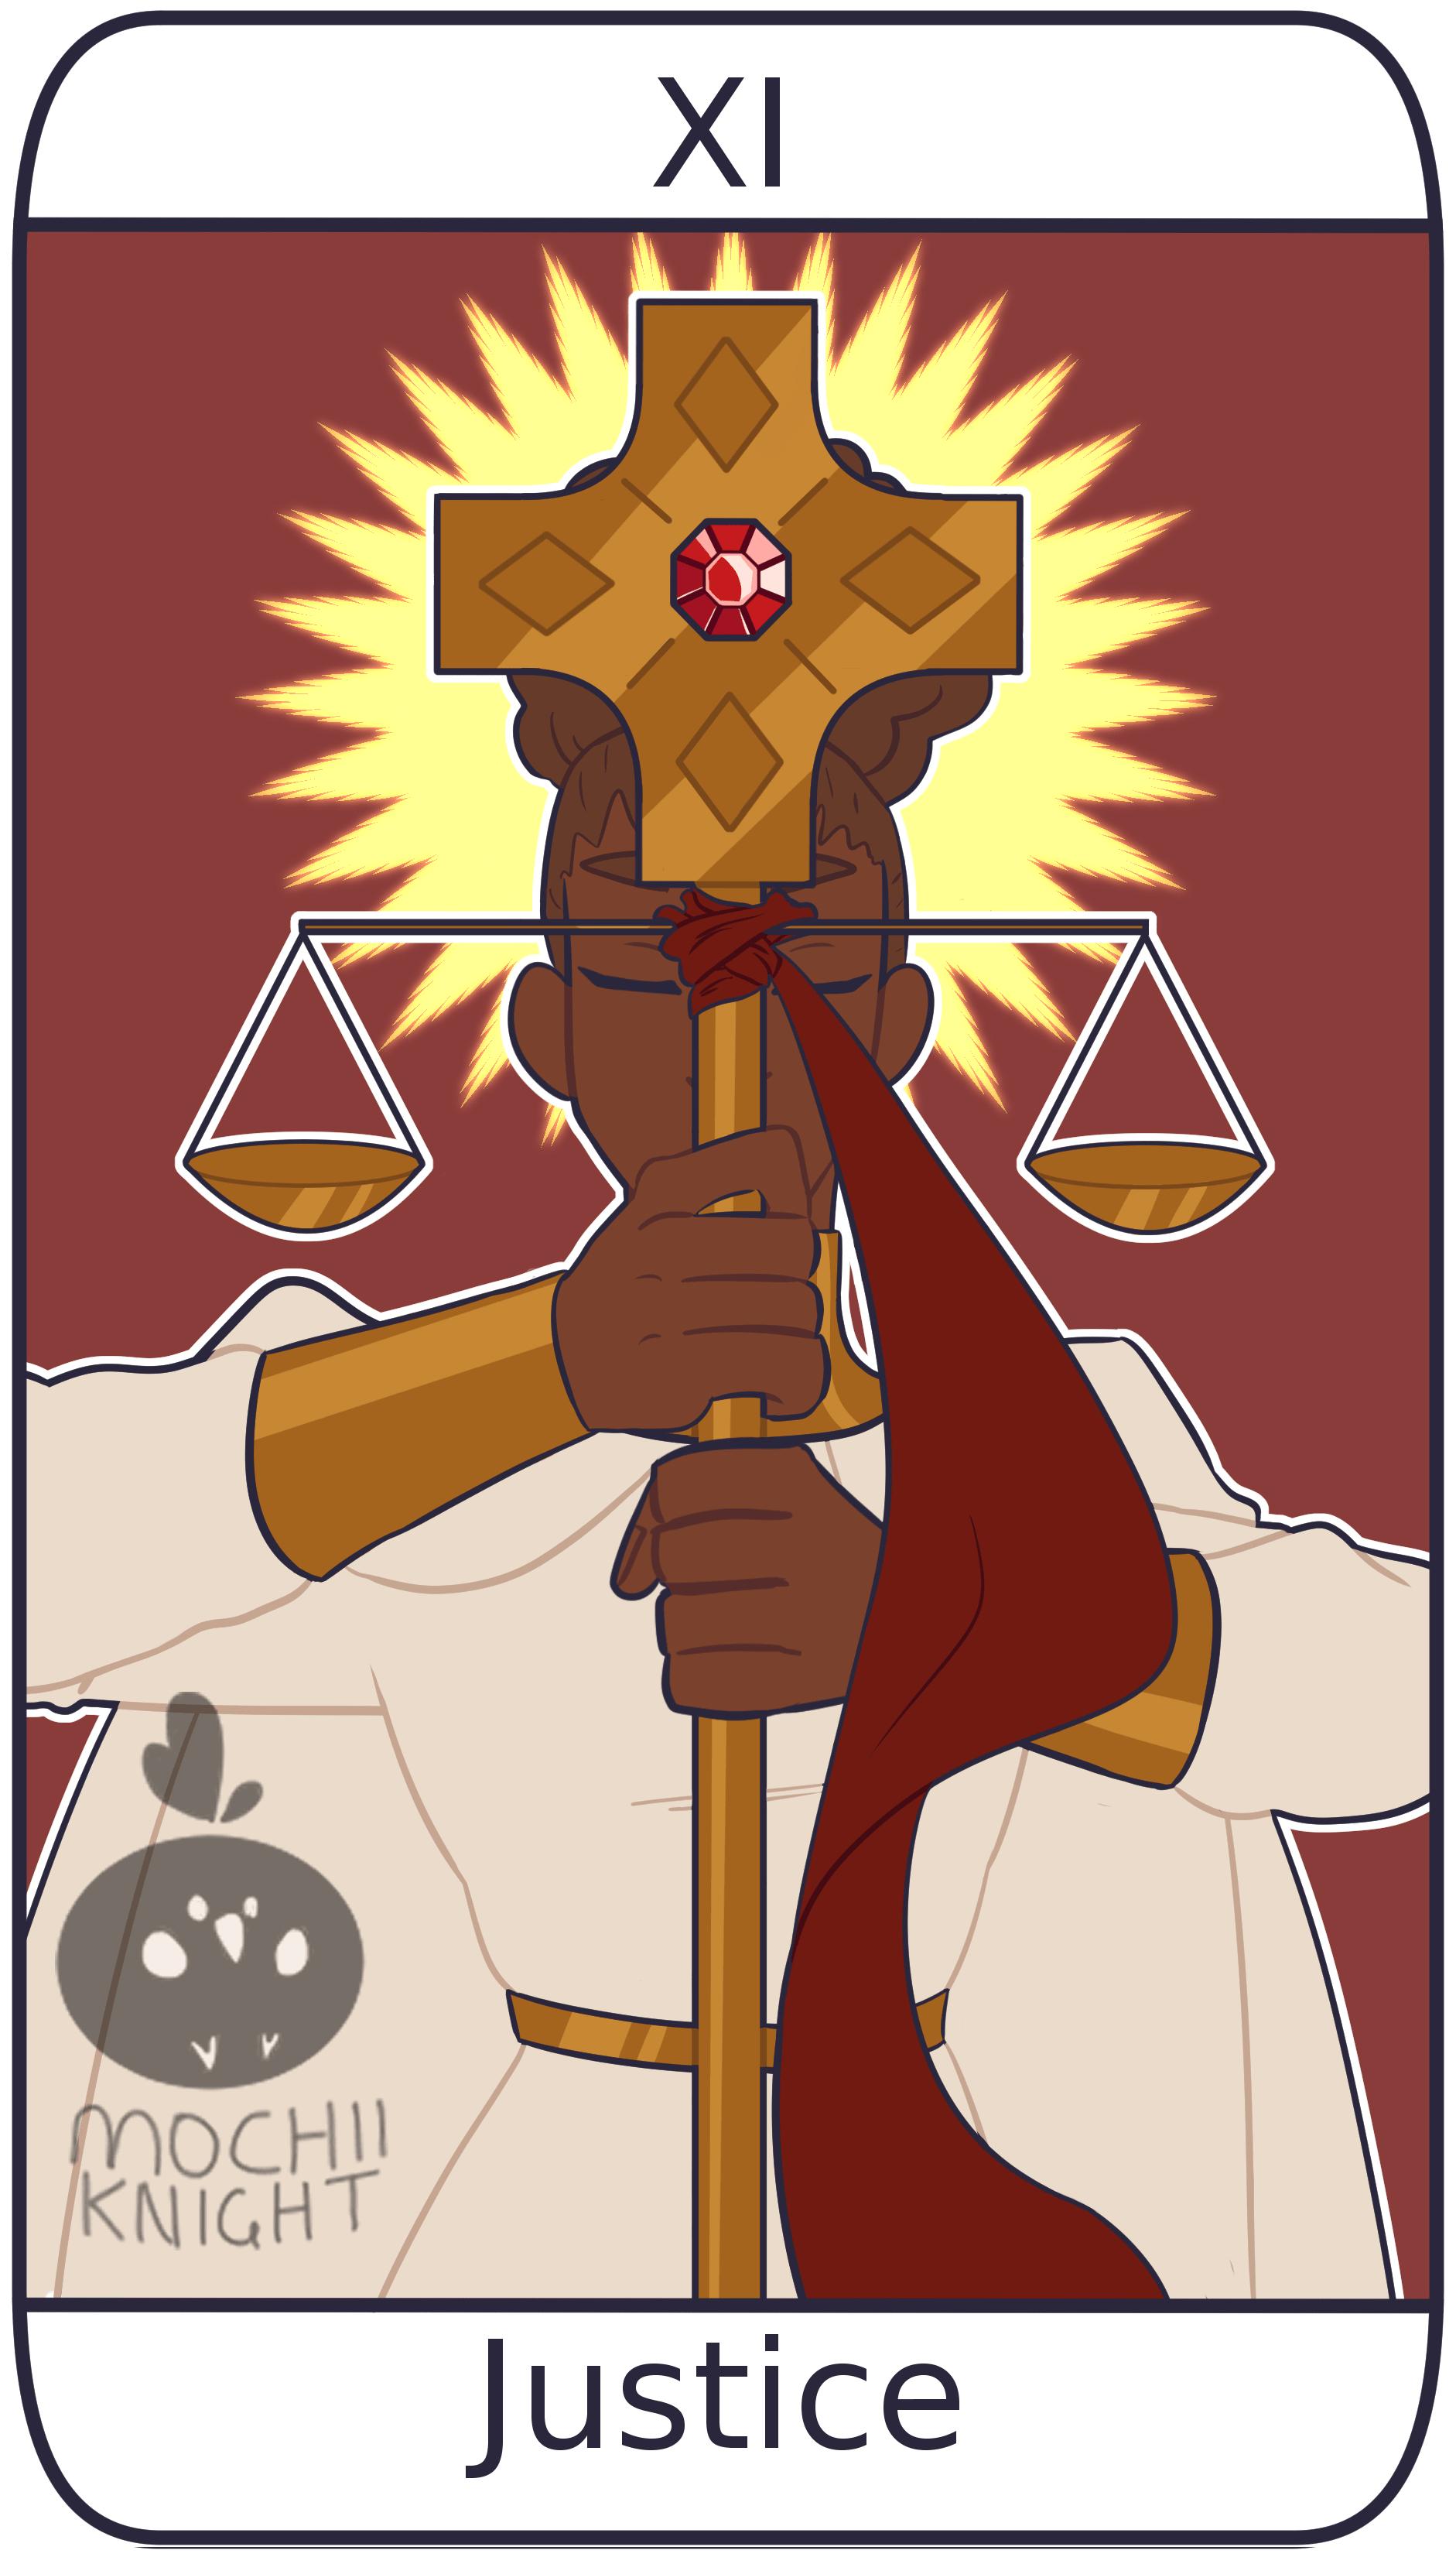 11 Justice